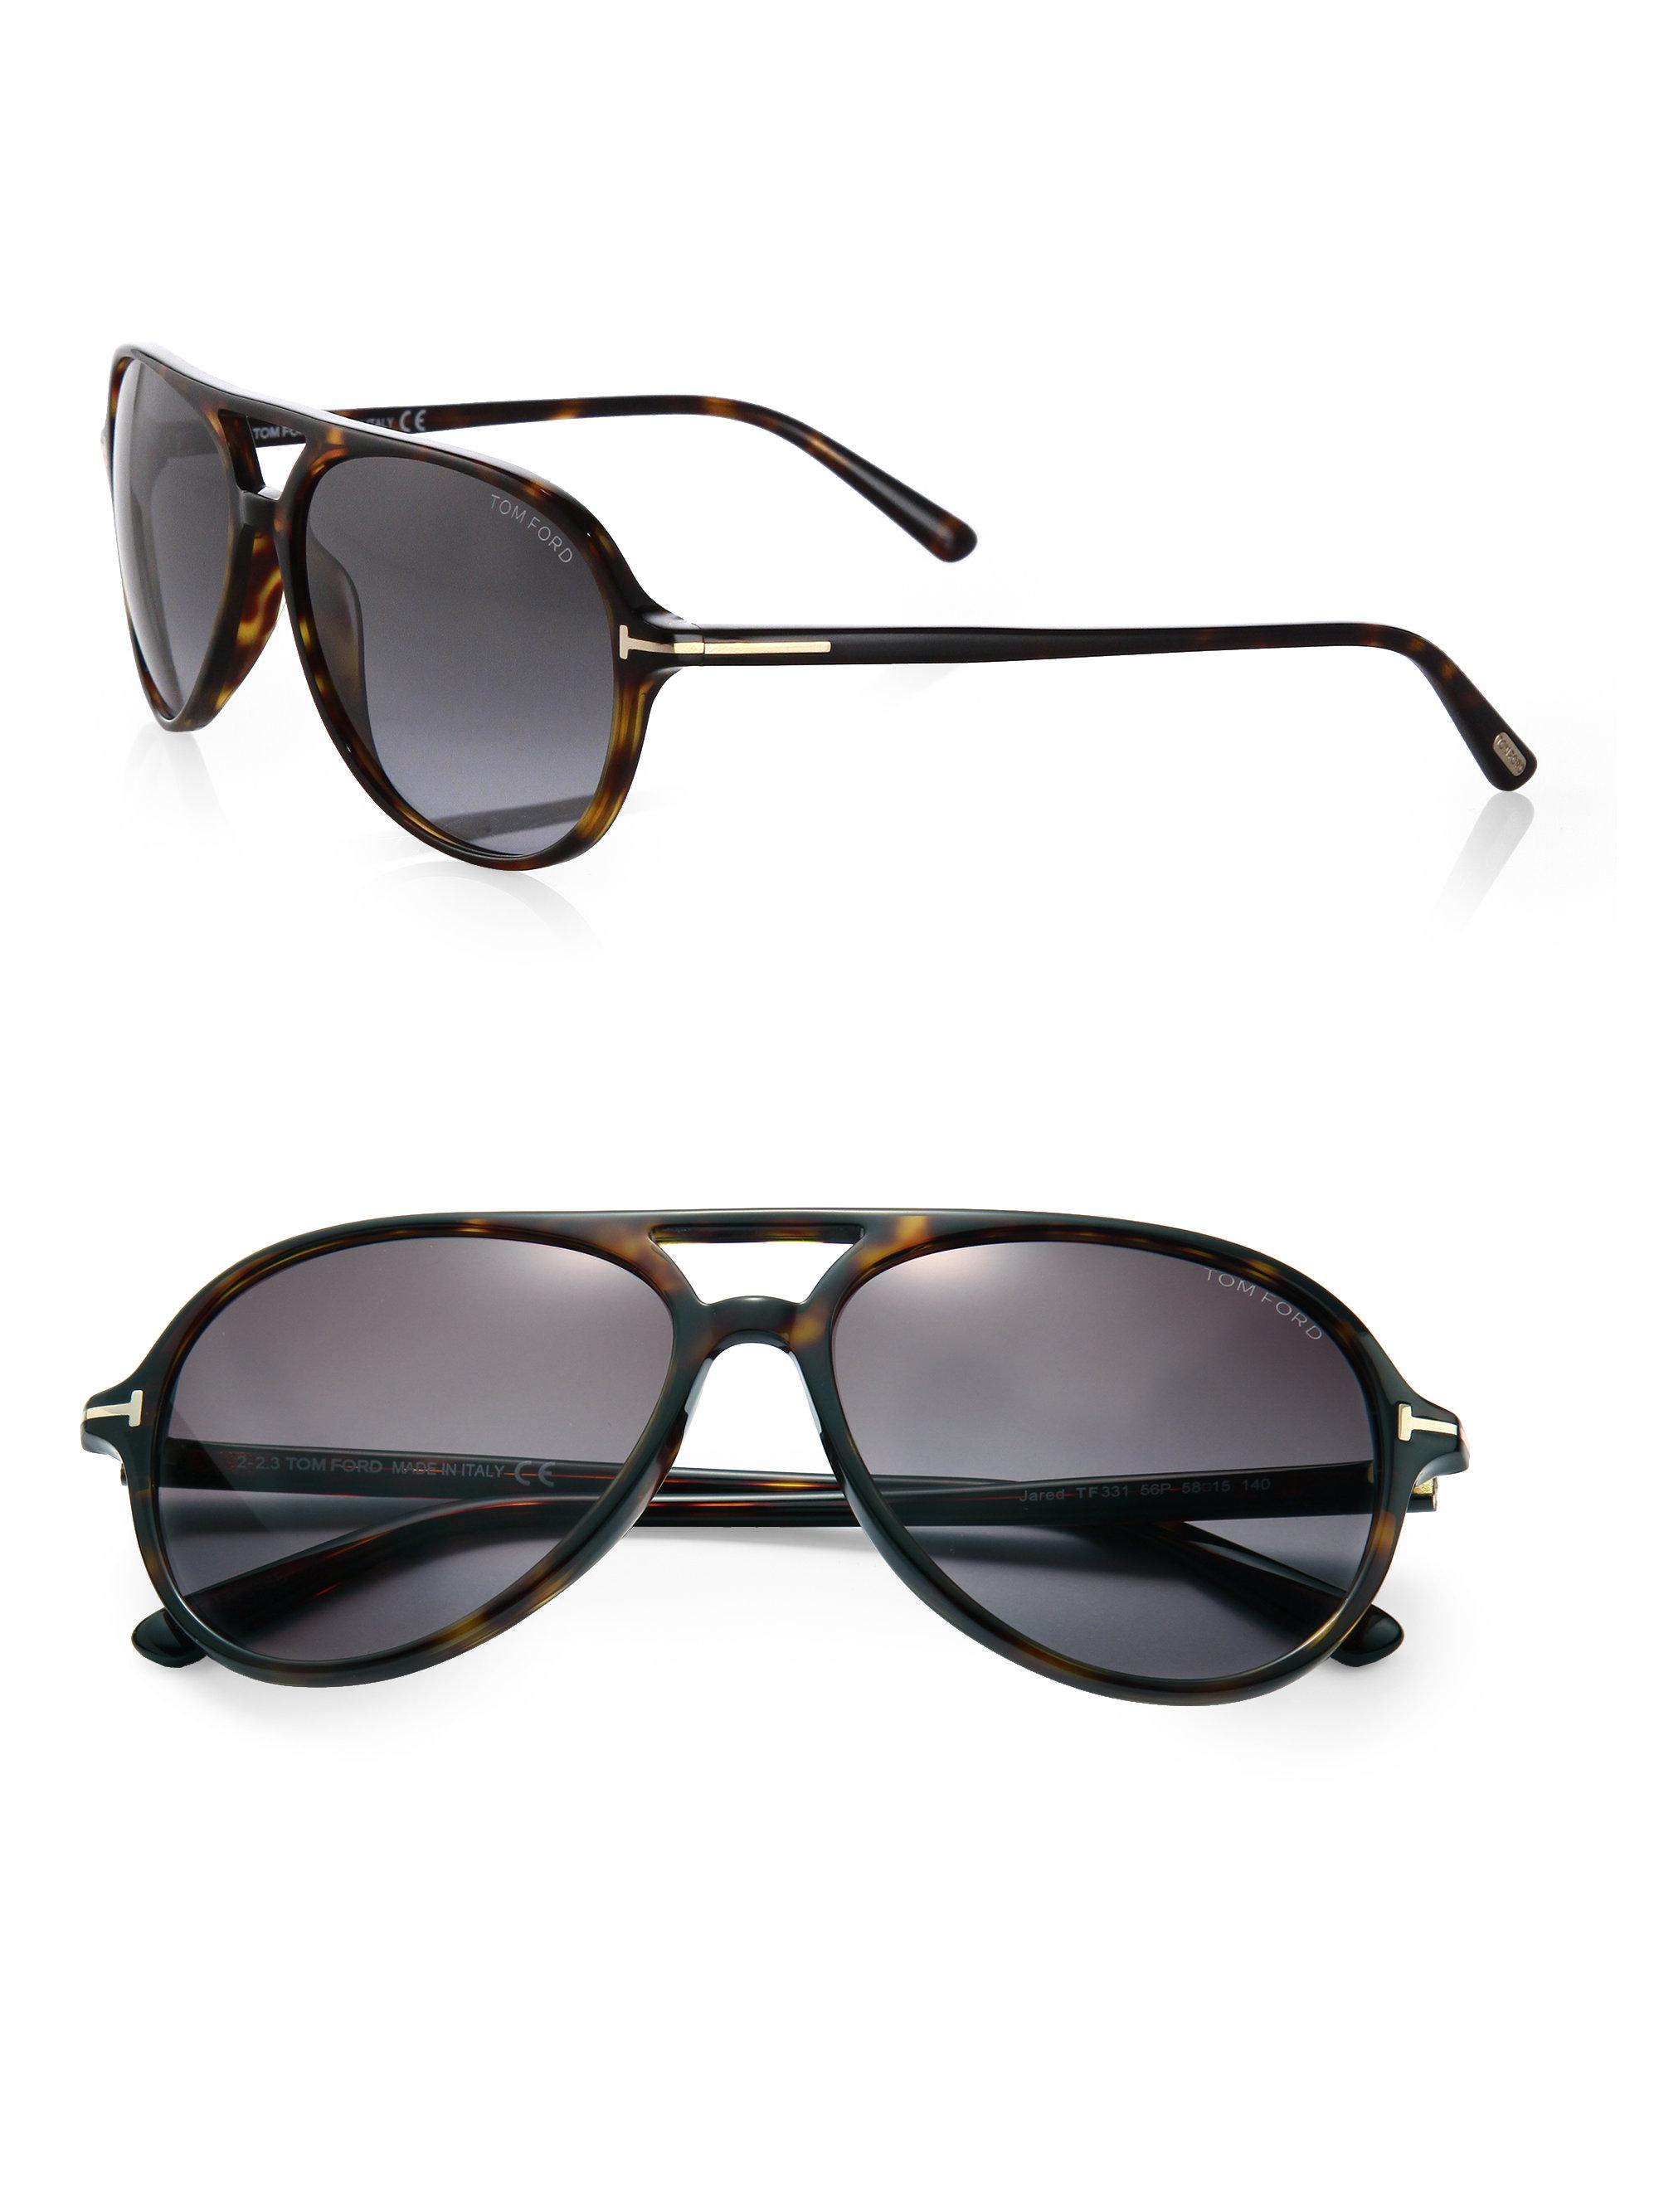 3f6ddc5980 Tom Ford Jared Plastic Aviator Sunglasses in Black - Lyst